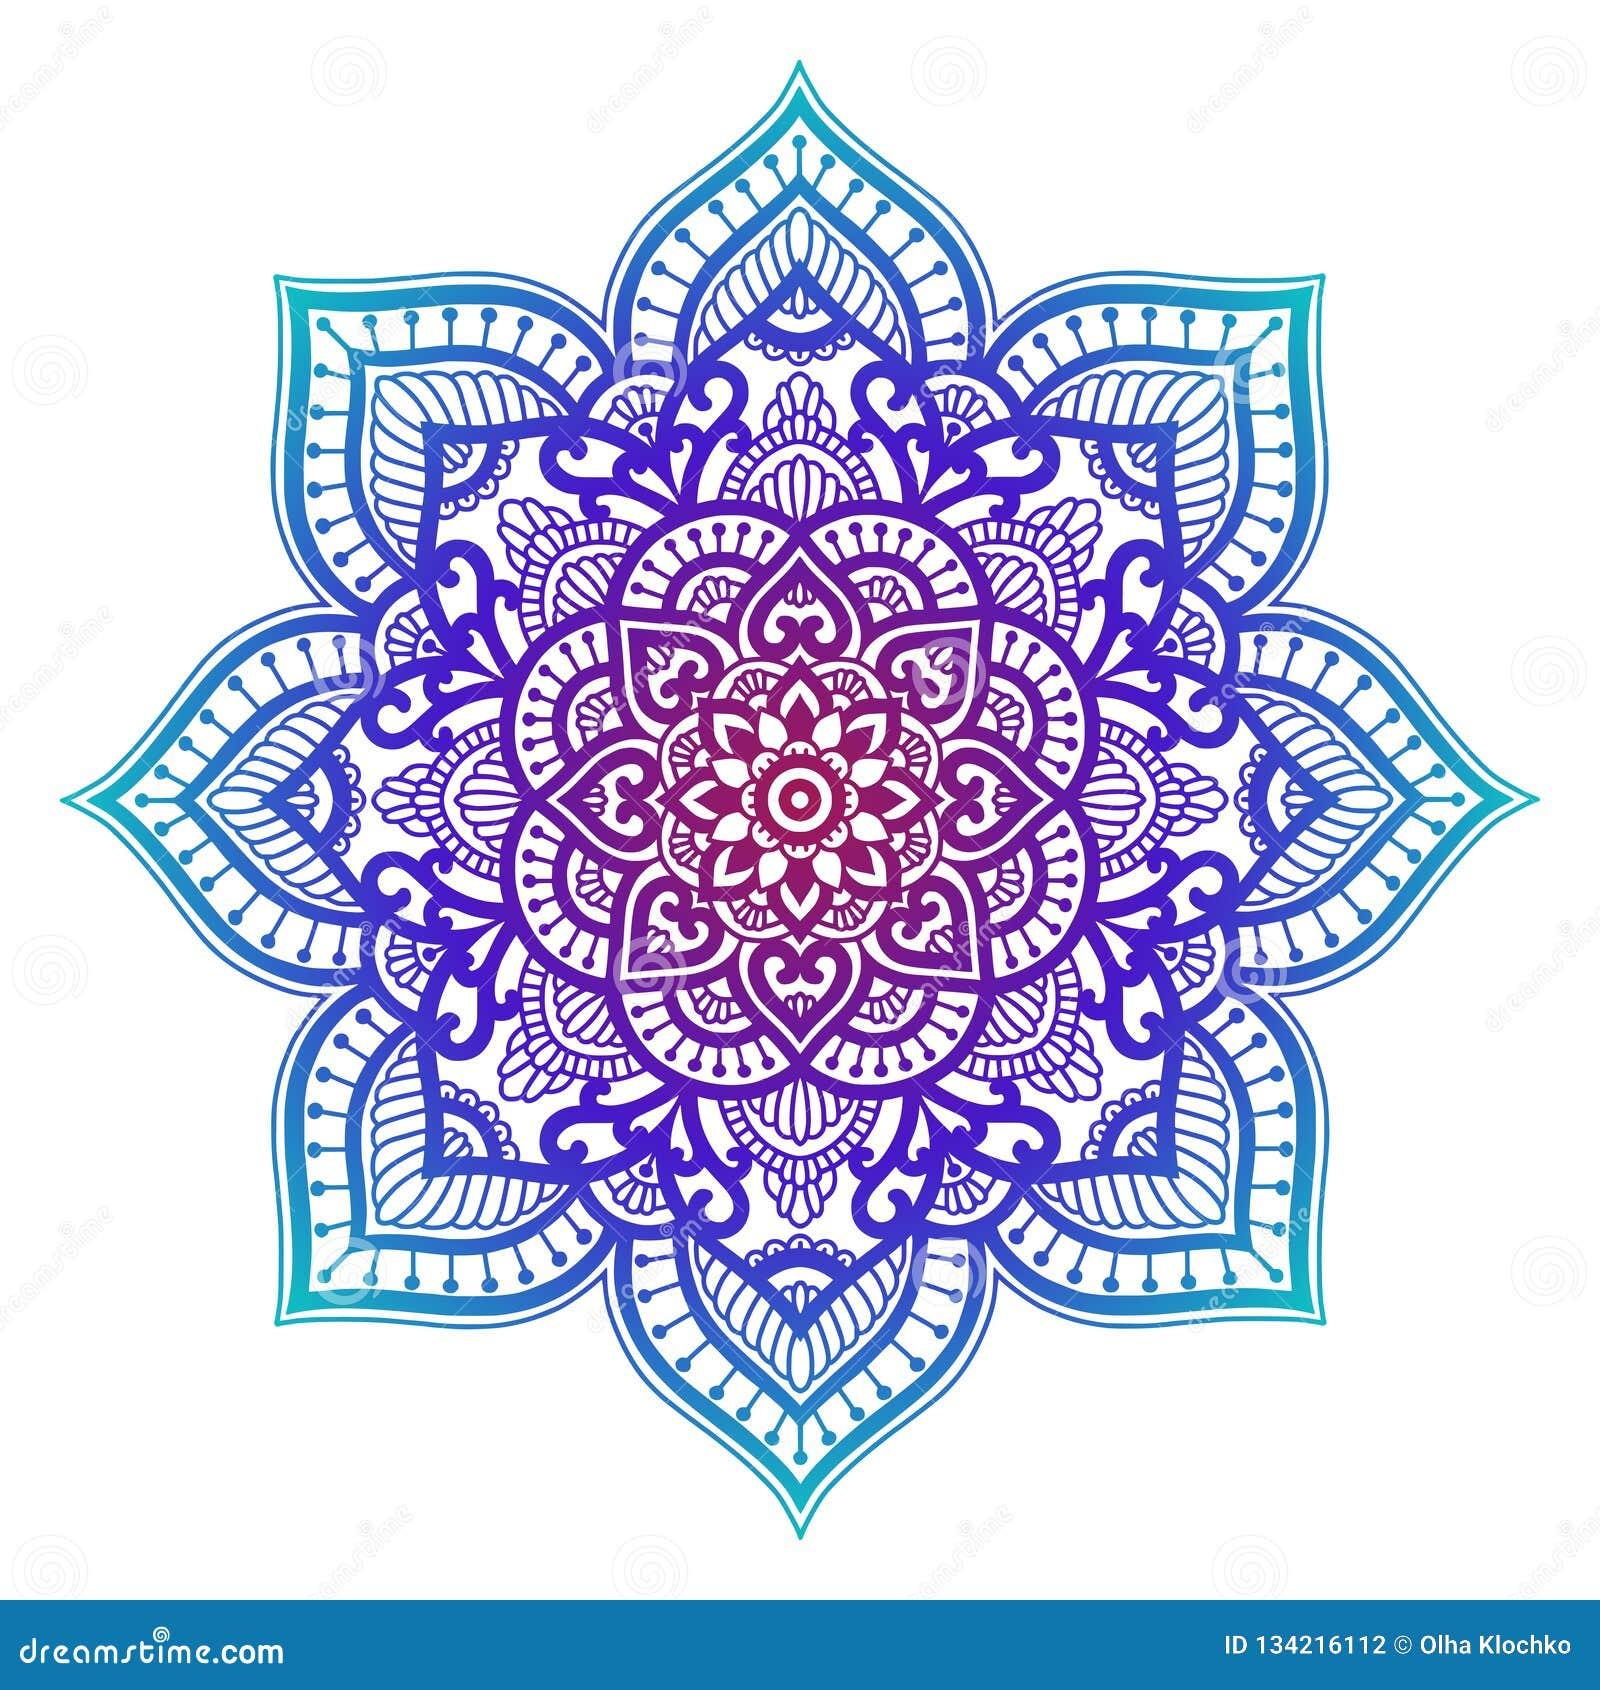 Mandala κλίσης Εθνική διακόσμηση κύκλων Συρμένο χέρι παραδοσιακό ινδικό στρογγυλό στοιχείο Πνευματικό henna γιόγκας περισυλλογής